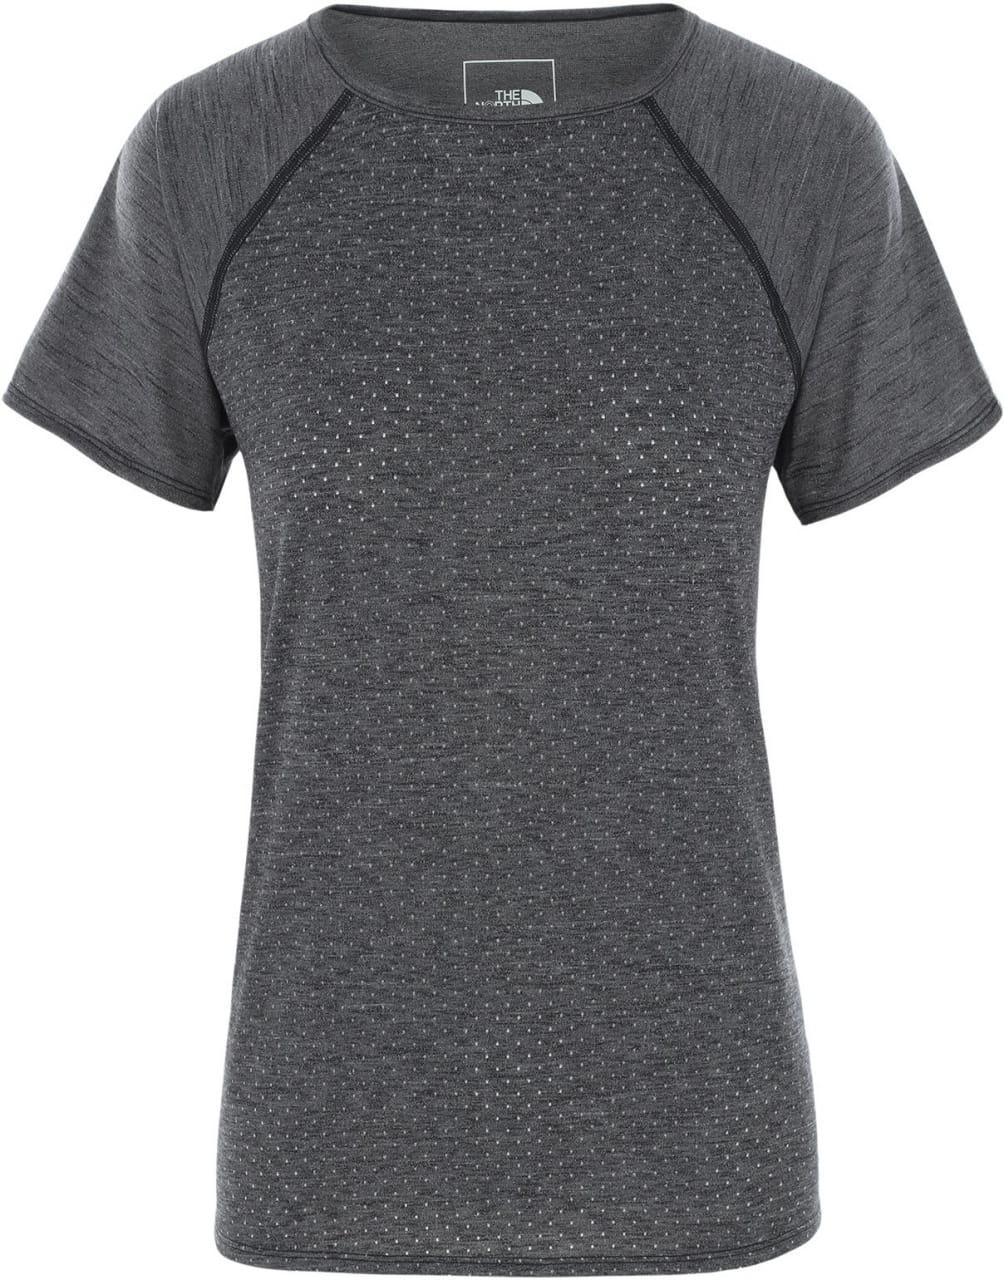 Dámké žakárové tričko The North Face Women's Active Trail Jacquard T-Shirt